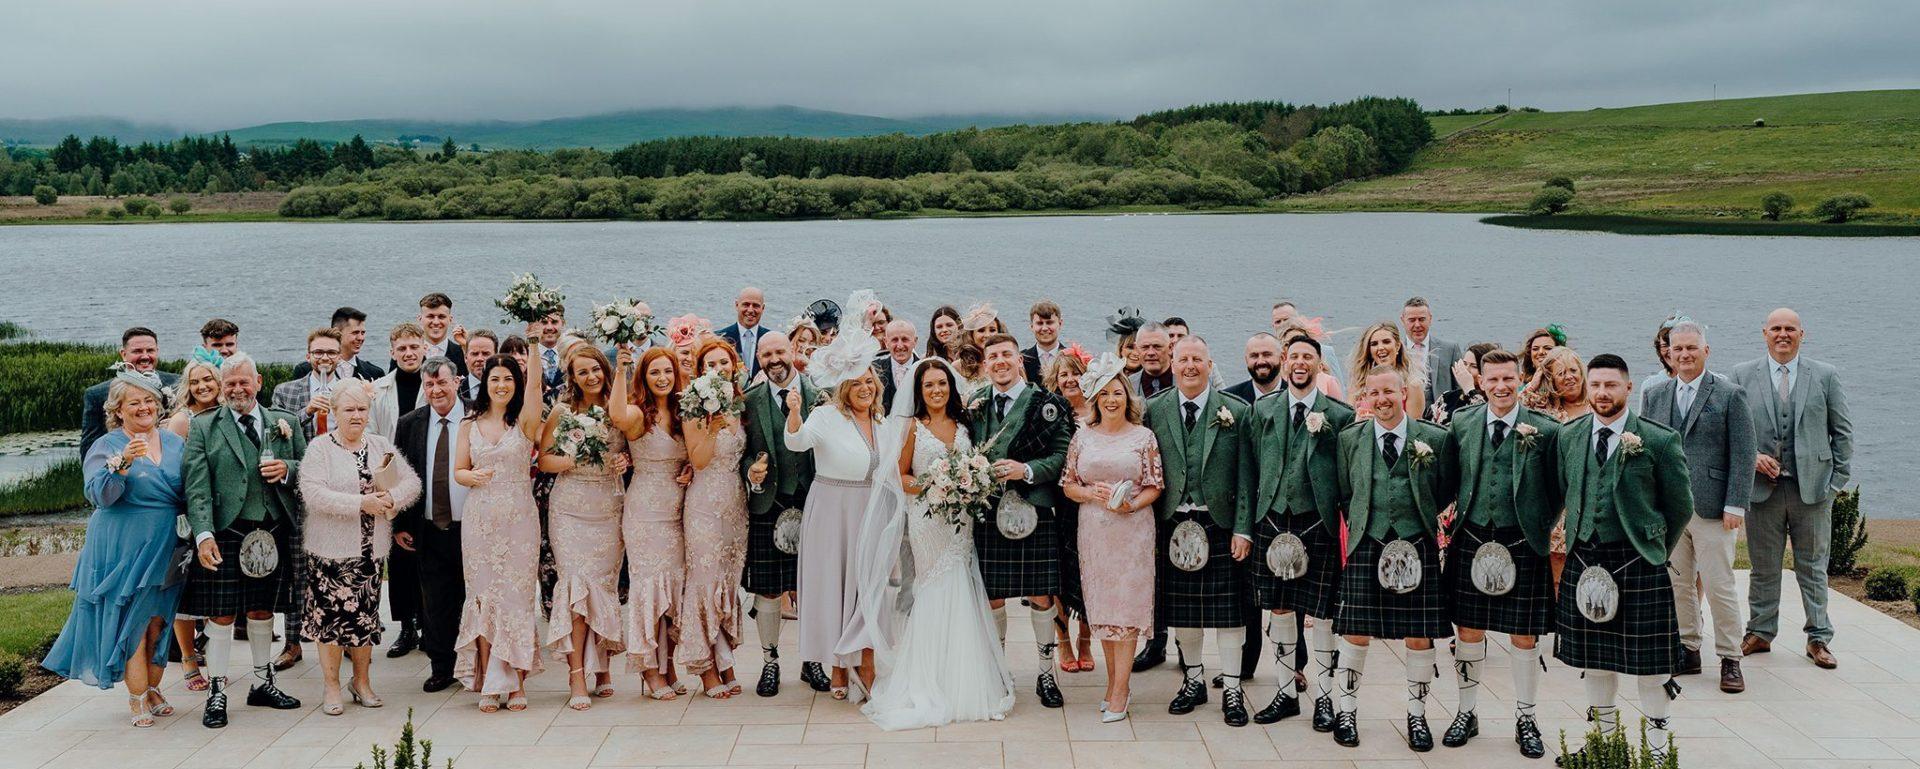 Lochside Hotel Weddings